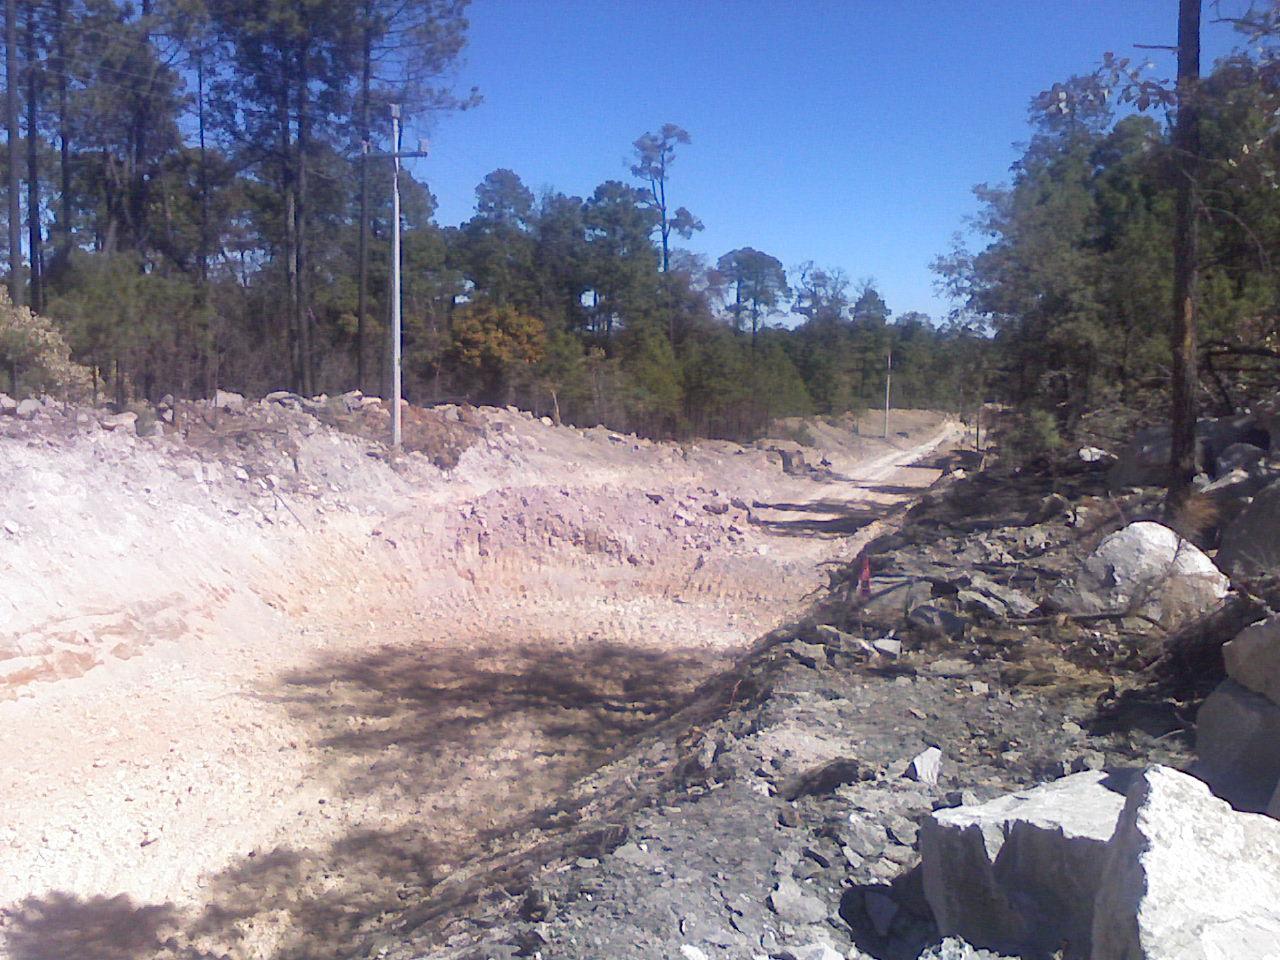 Illegal road cutting through the Community of Tuapurie